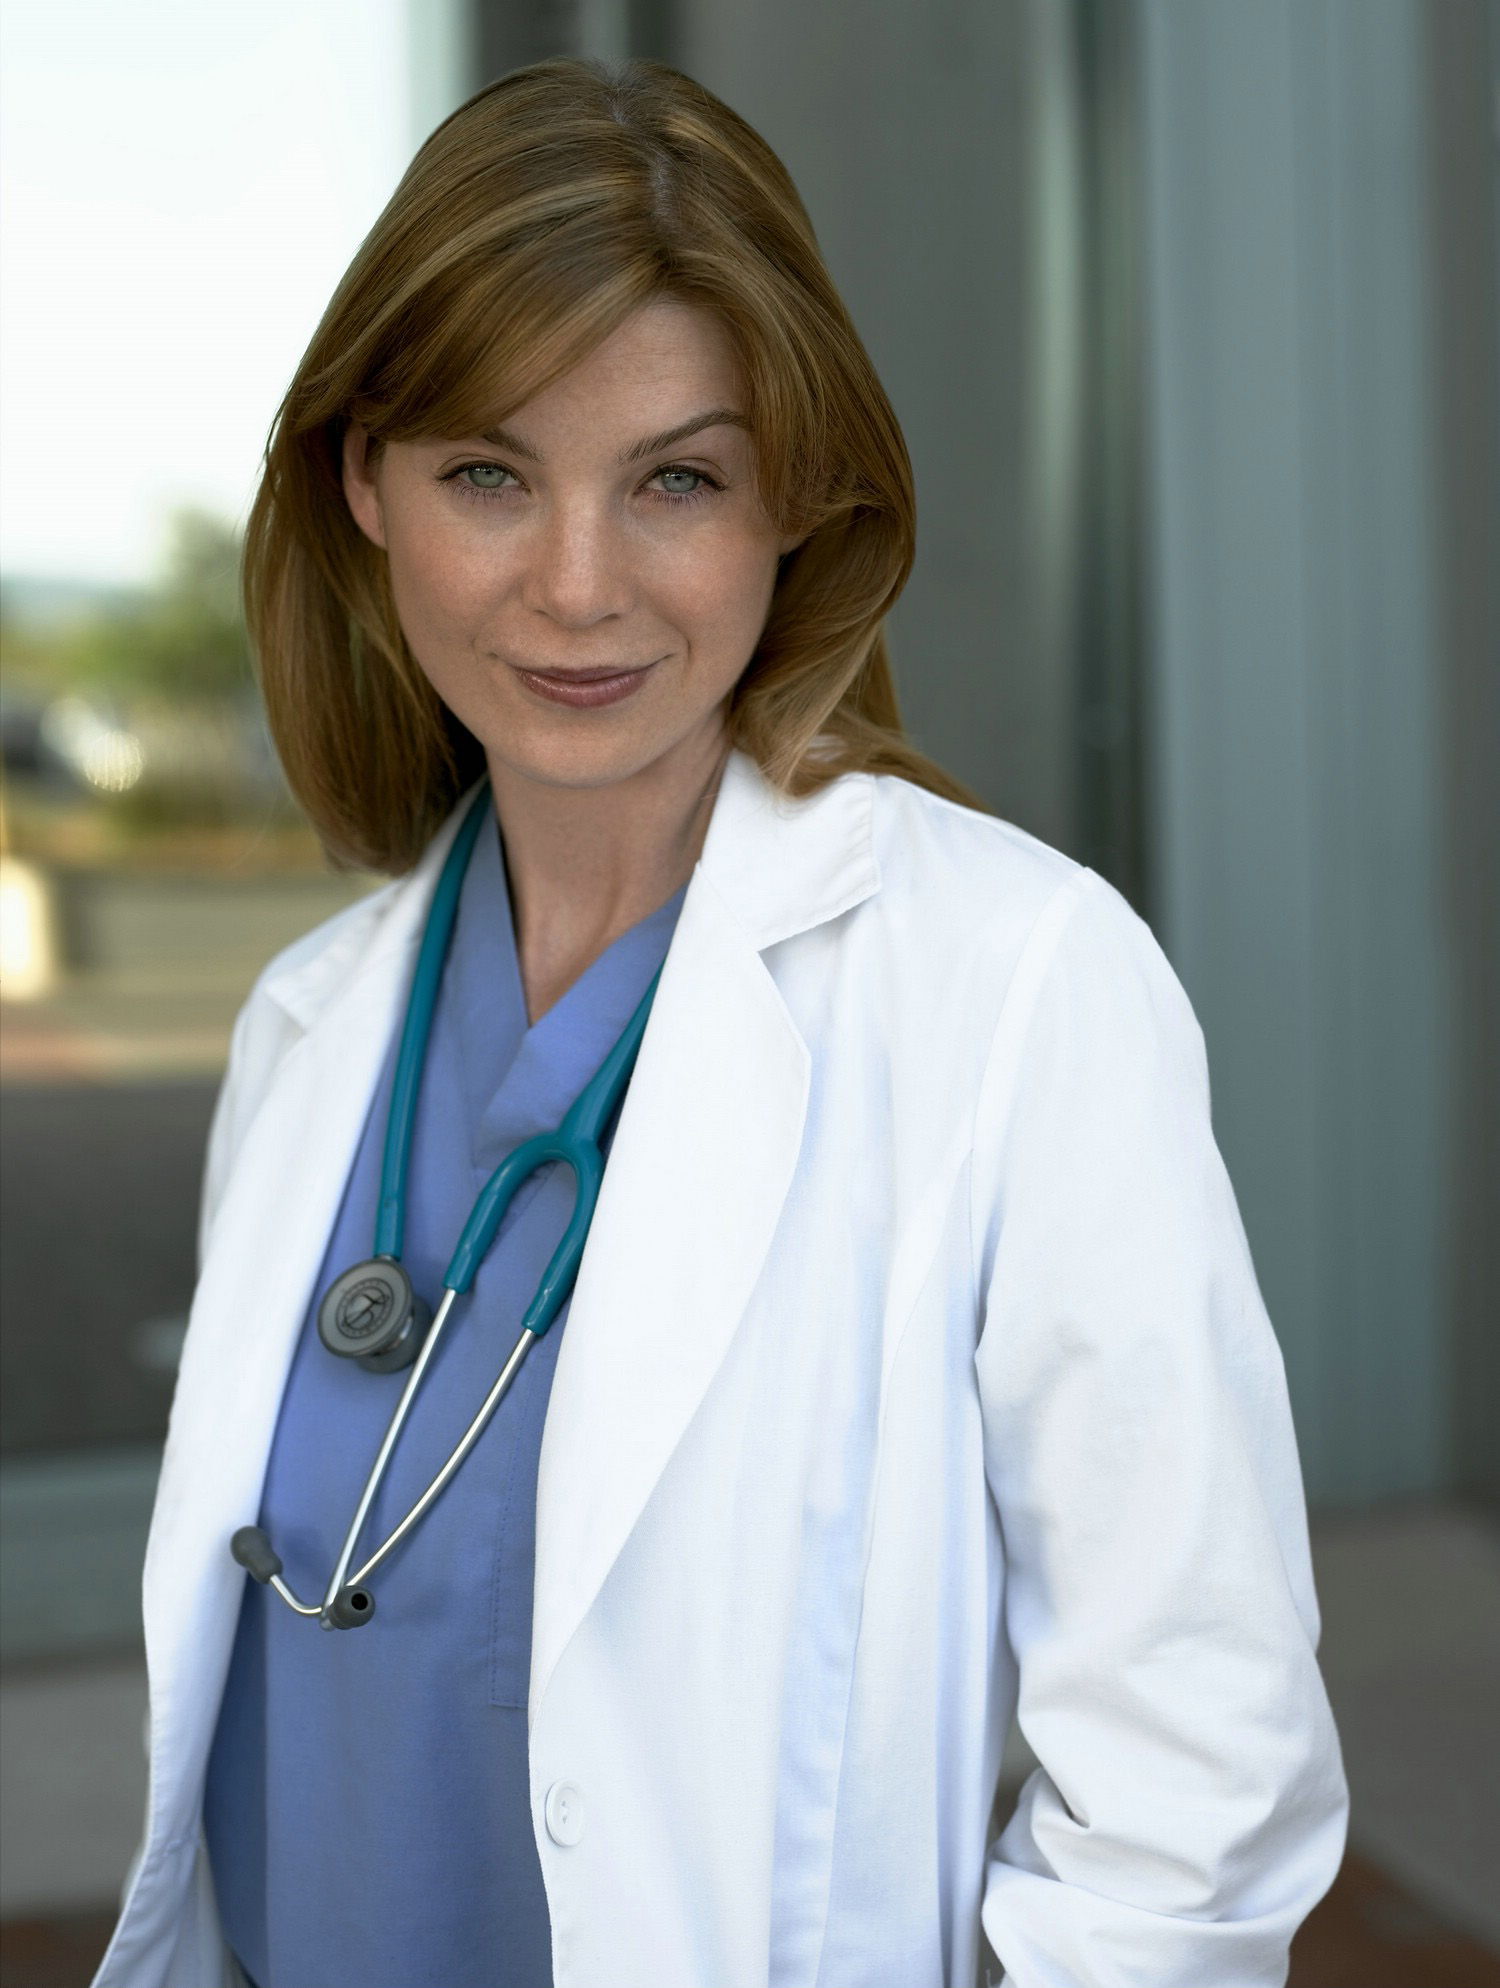 MeredithGreyPromo1-1 a5f8d